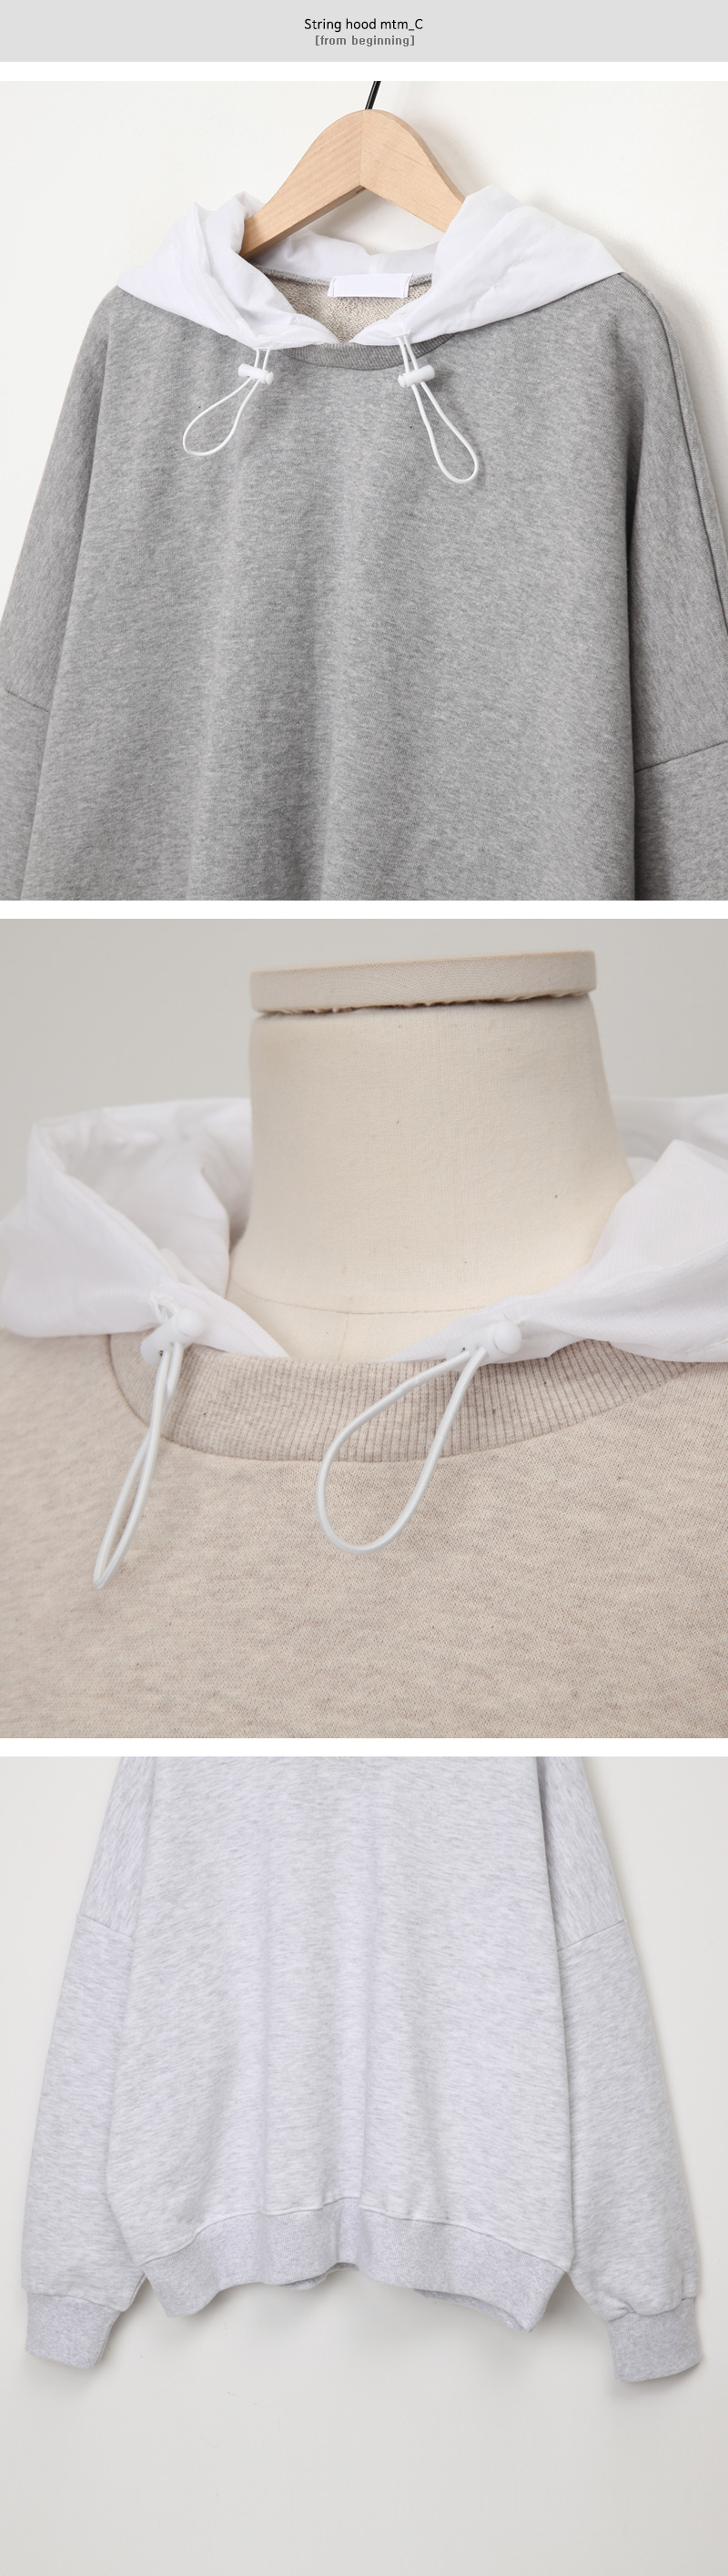 String hood mtm_C